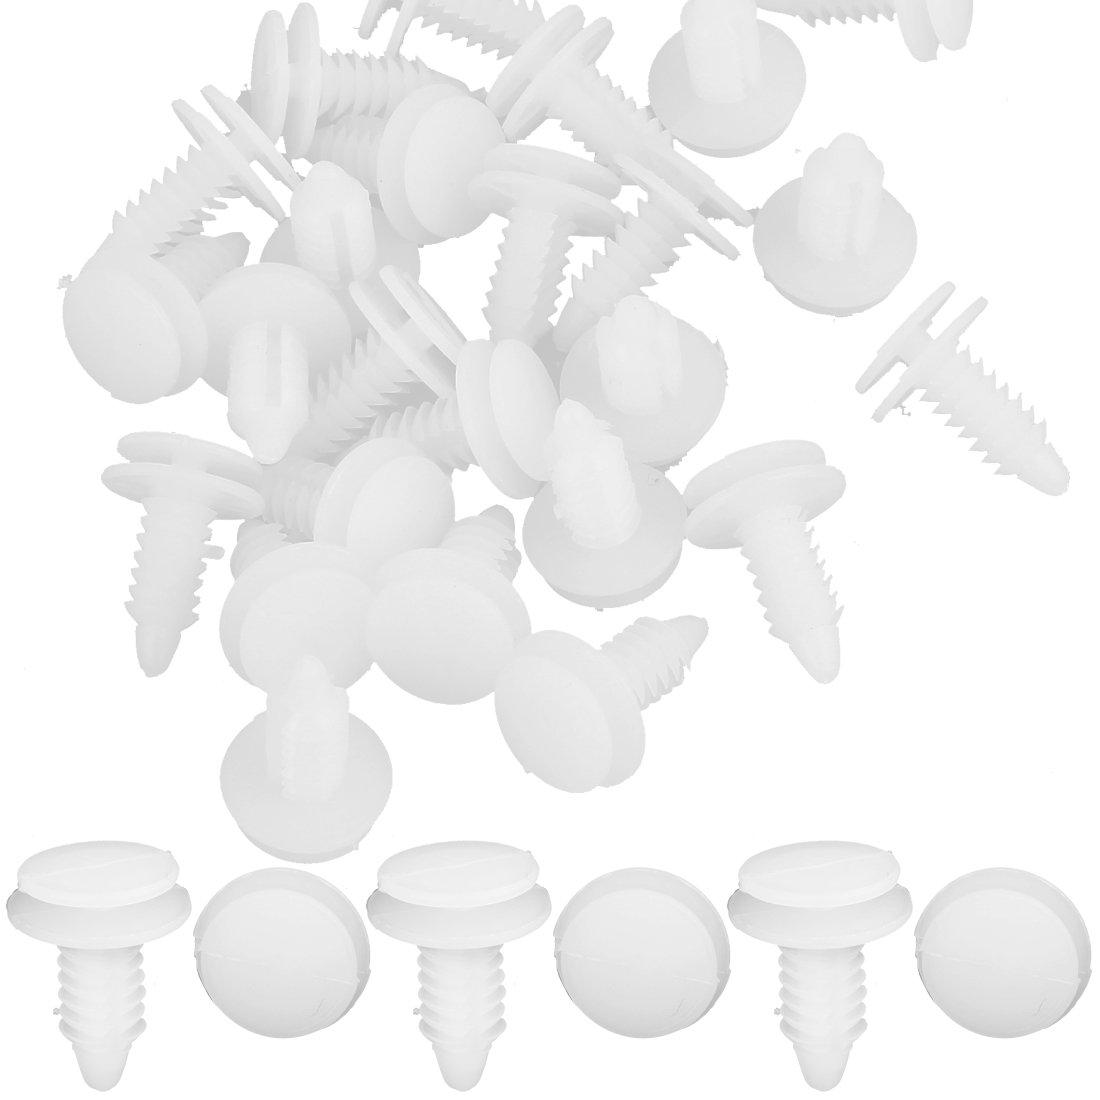 uxcell/® 25 Pcs White Push Fastener Rivet Retainer Clips